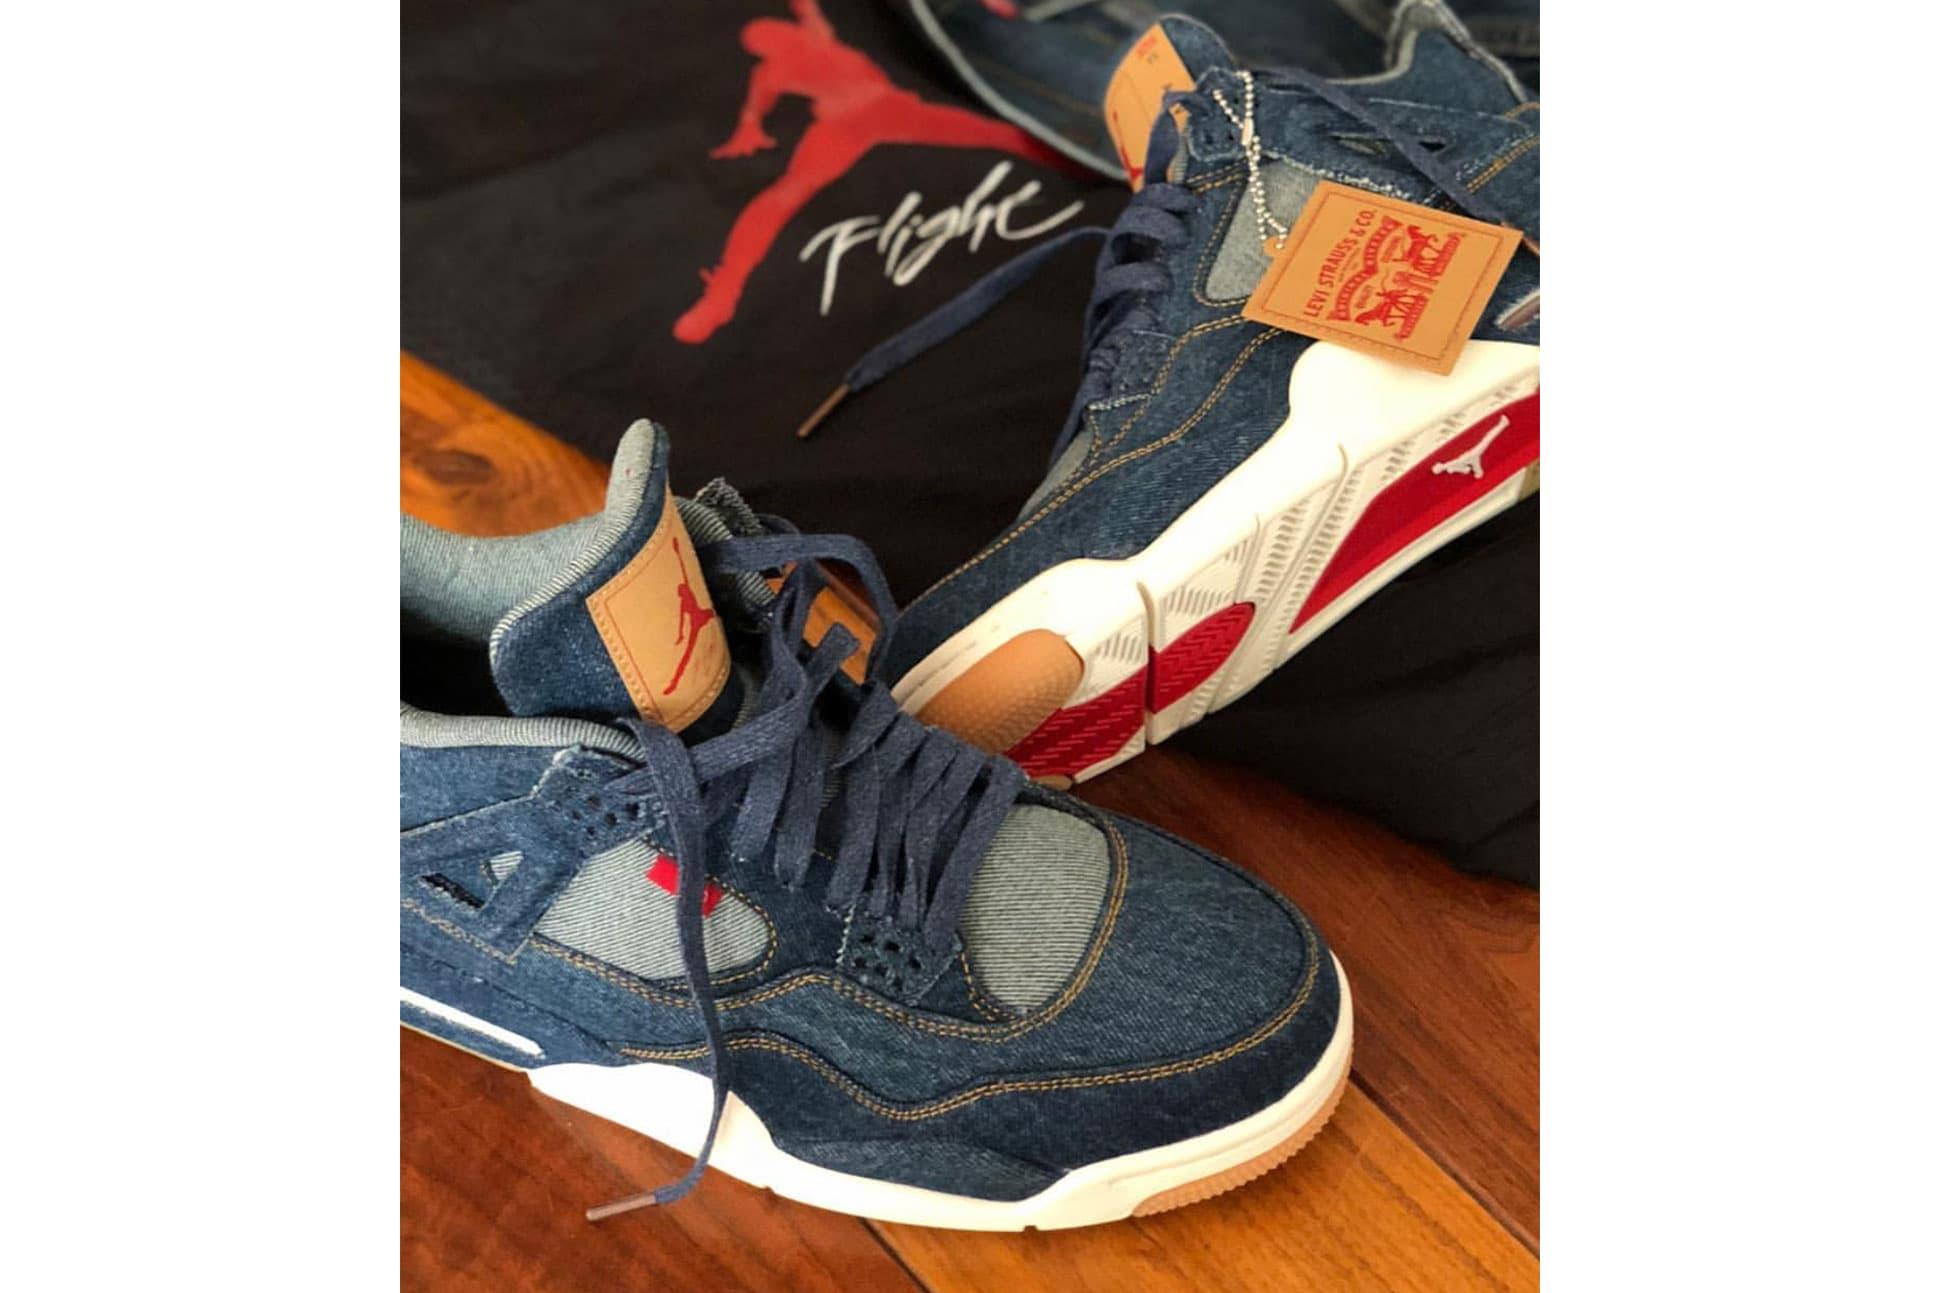 Eric Koston Reveals the Levi's x Air Jordan 4 Will Release With a Reversible Denim/Nylon Jacket